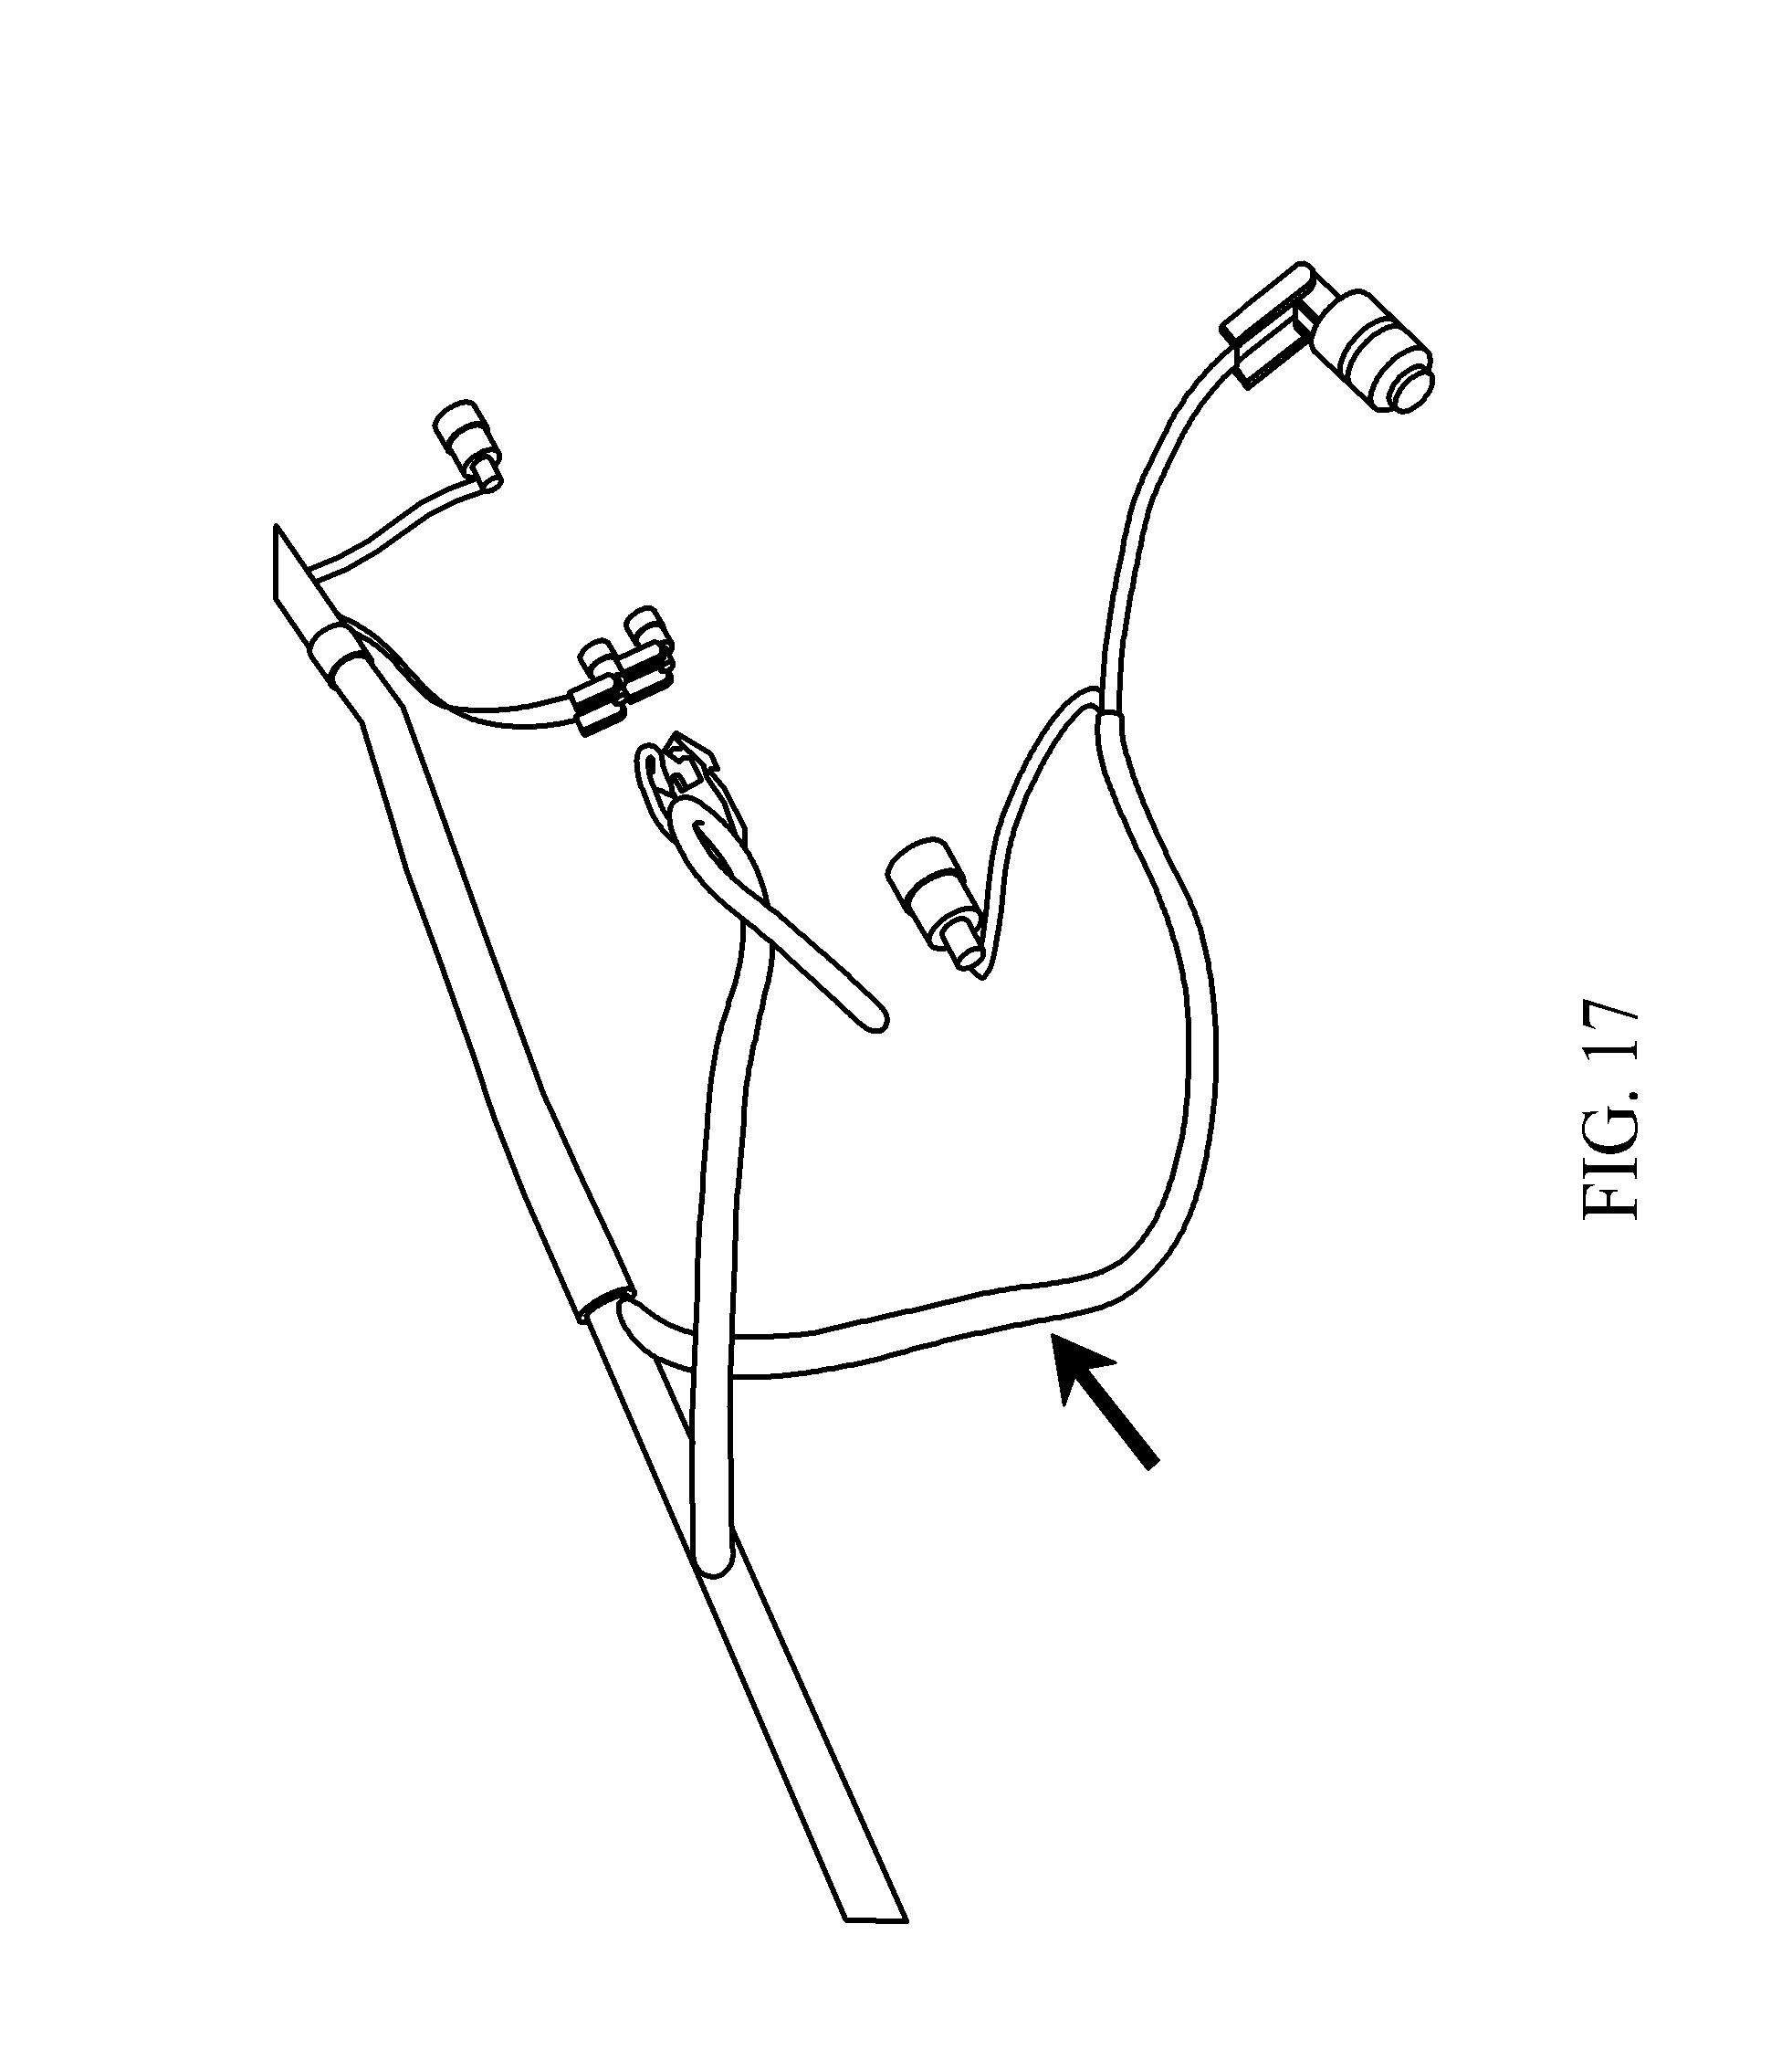 2014 polaris ace 325 wiring diagram